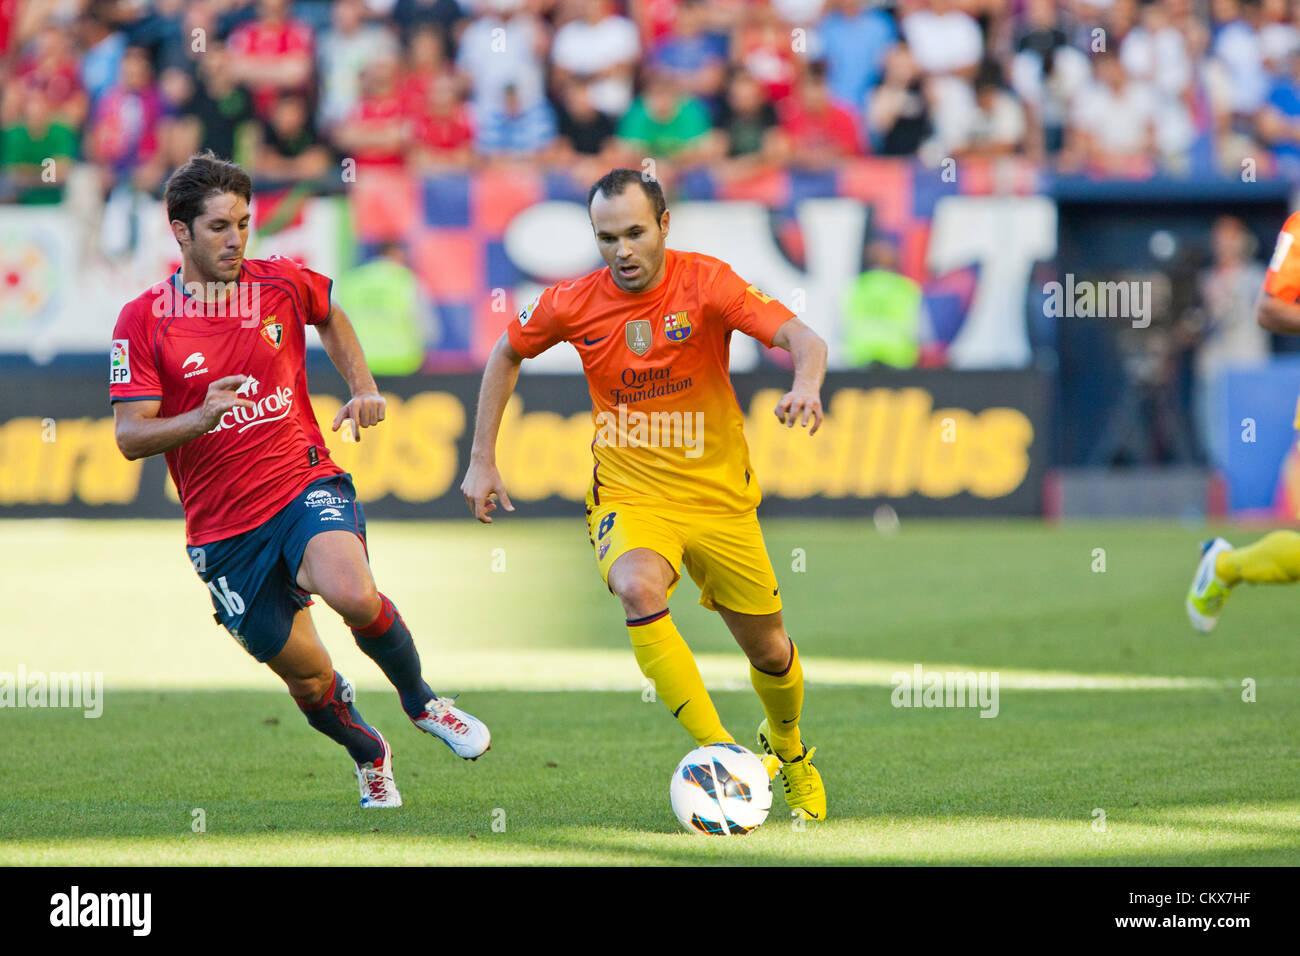 e592838a98d40e Andres Iniesta Fc Barcelona Stock Photos   Andres Iniesta Fc ...